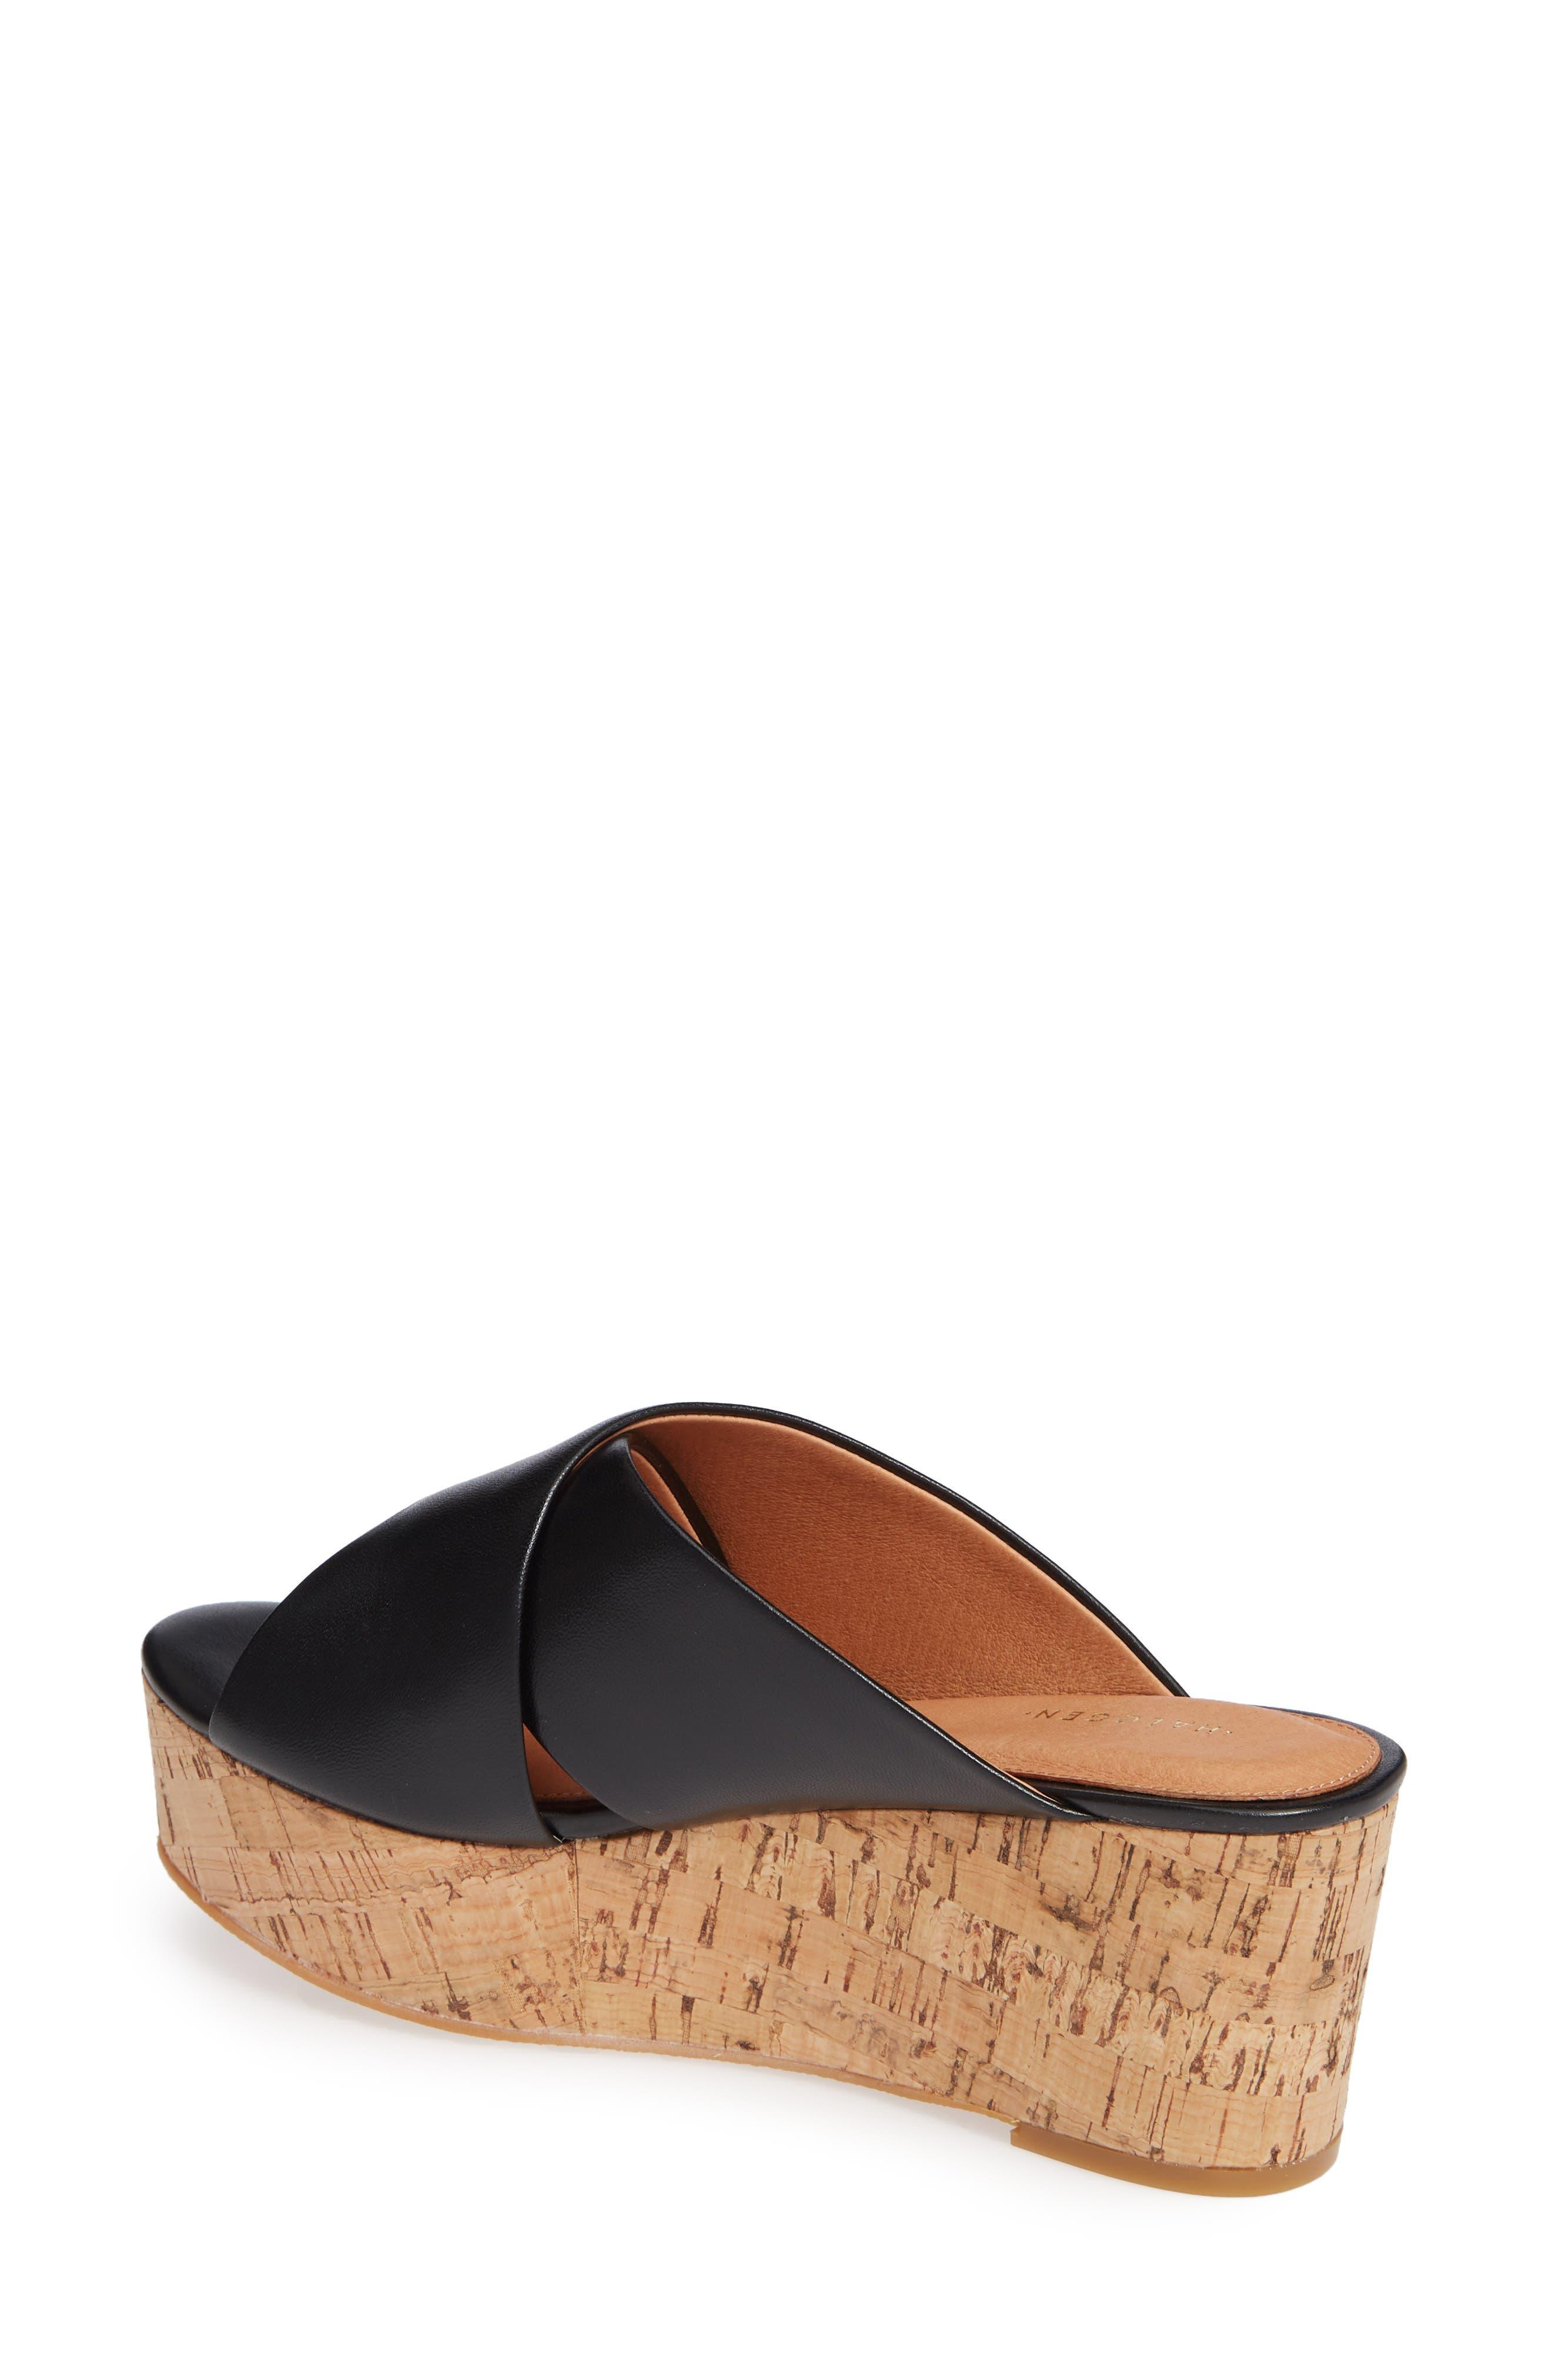 Elena Platform Wedge Sandal,                             Alternate thumbnail 2, color,                             BLACK LEATHER